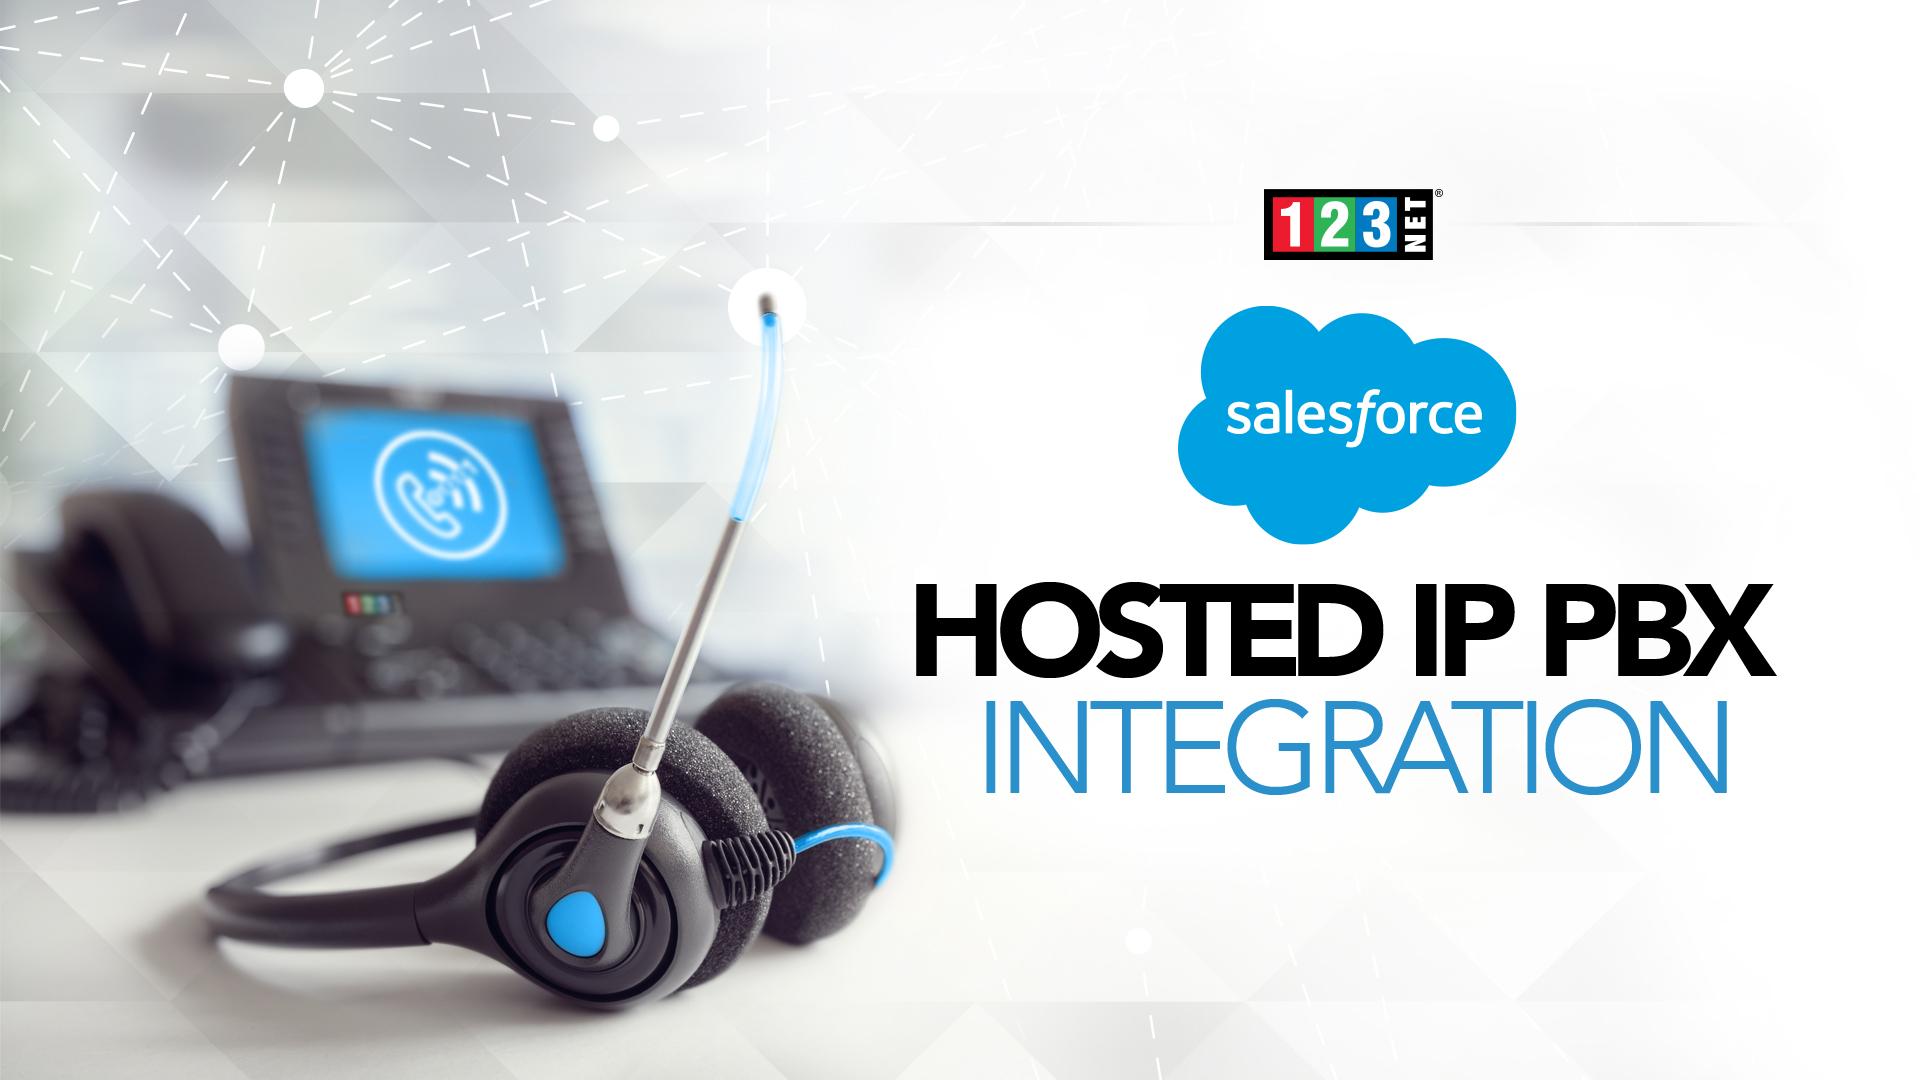 123NET Voice Services Reveal Salesforce Hosted IP PBX Integration